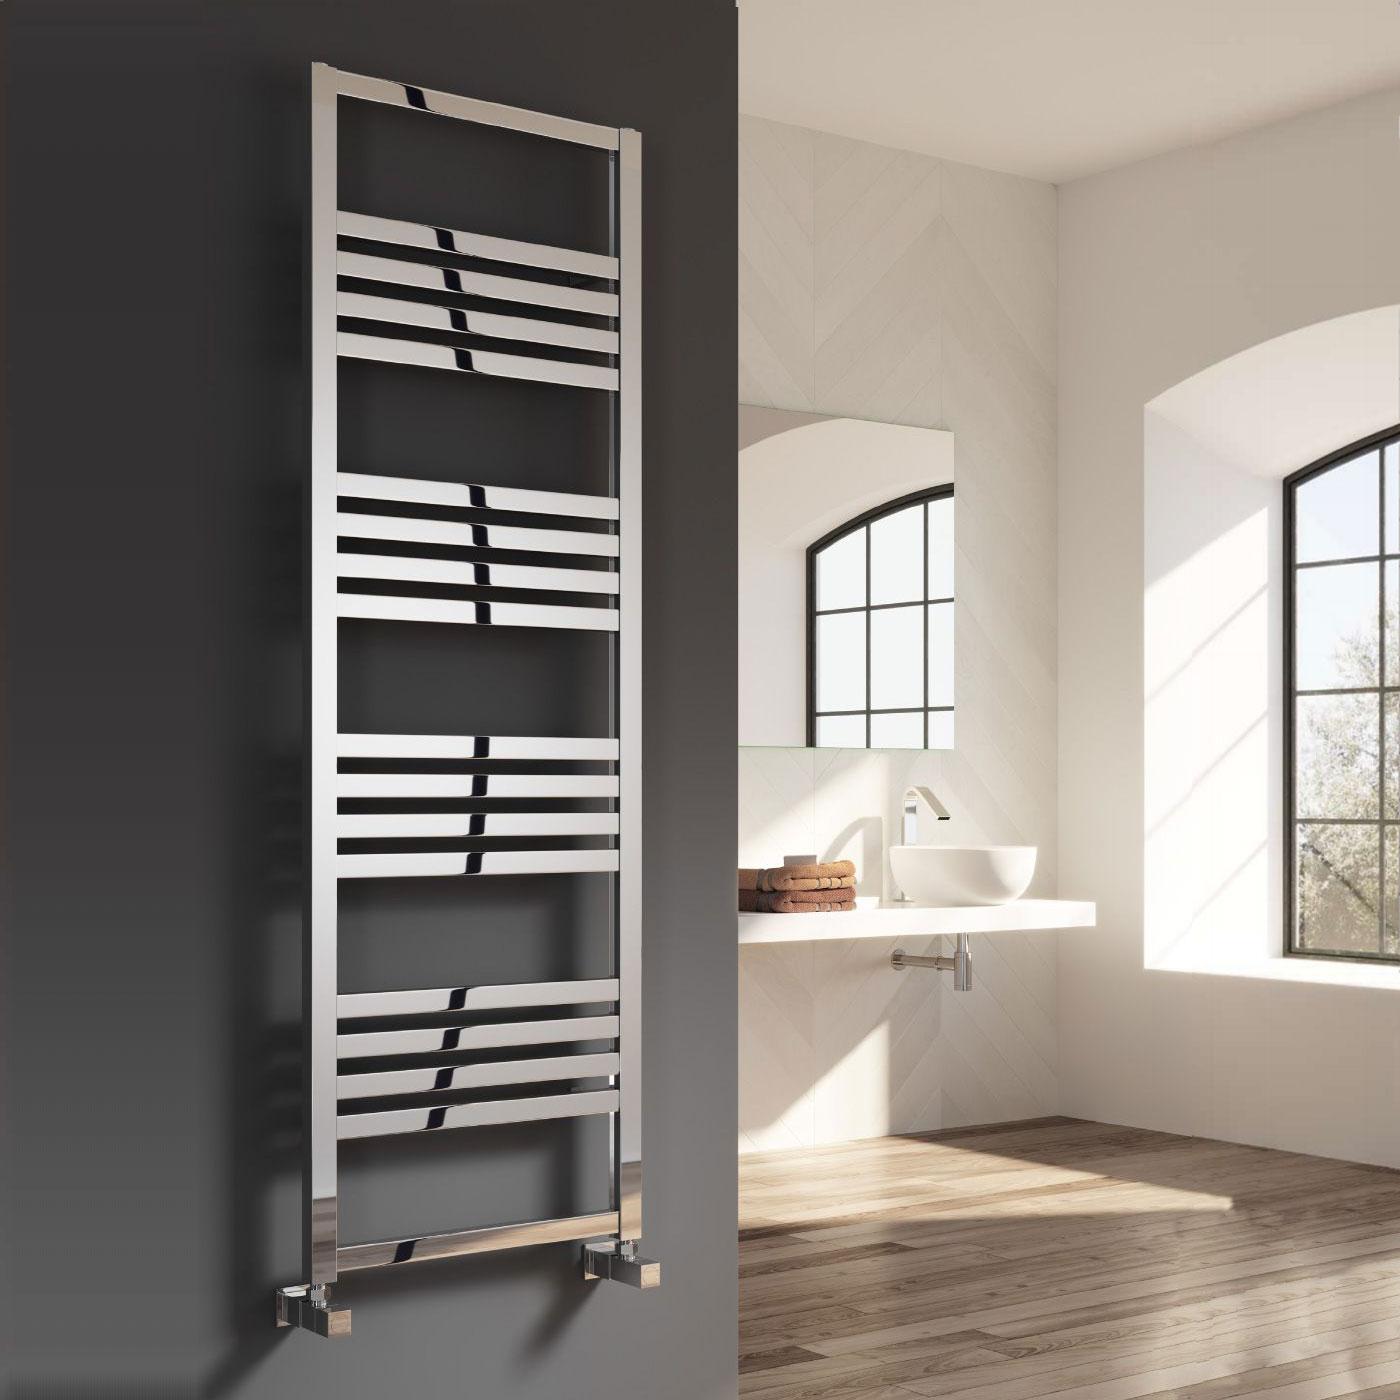 Reina Bolca Designer Heated Towel Rail 870mm H x 485mm W Polished